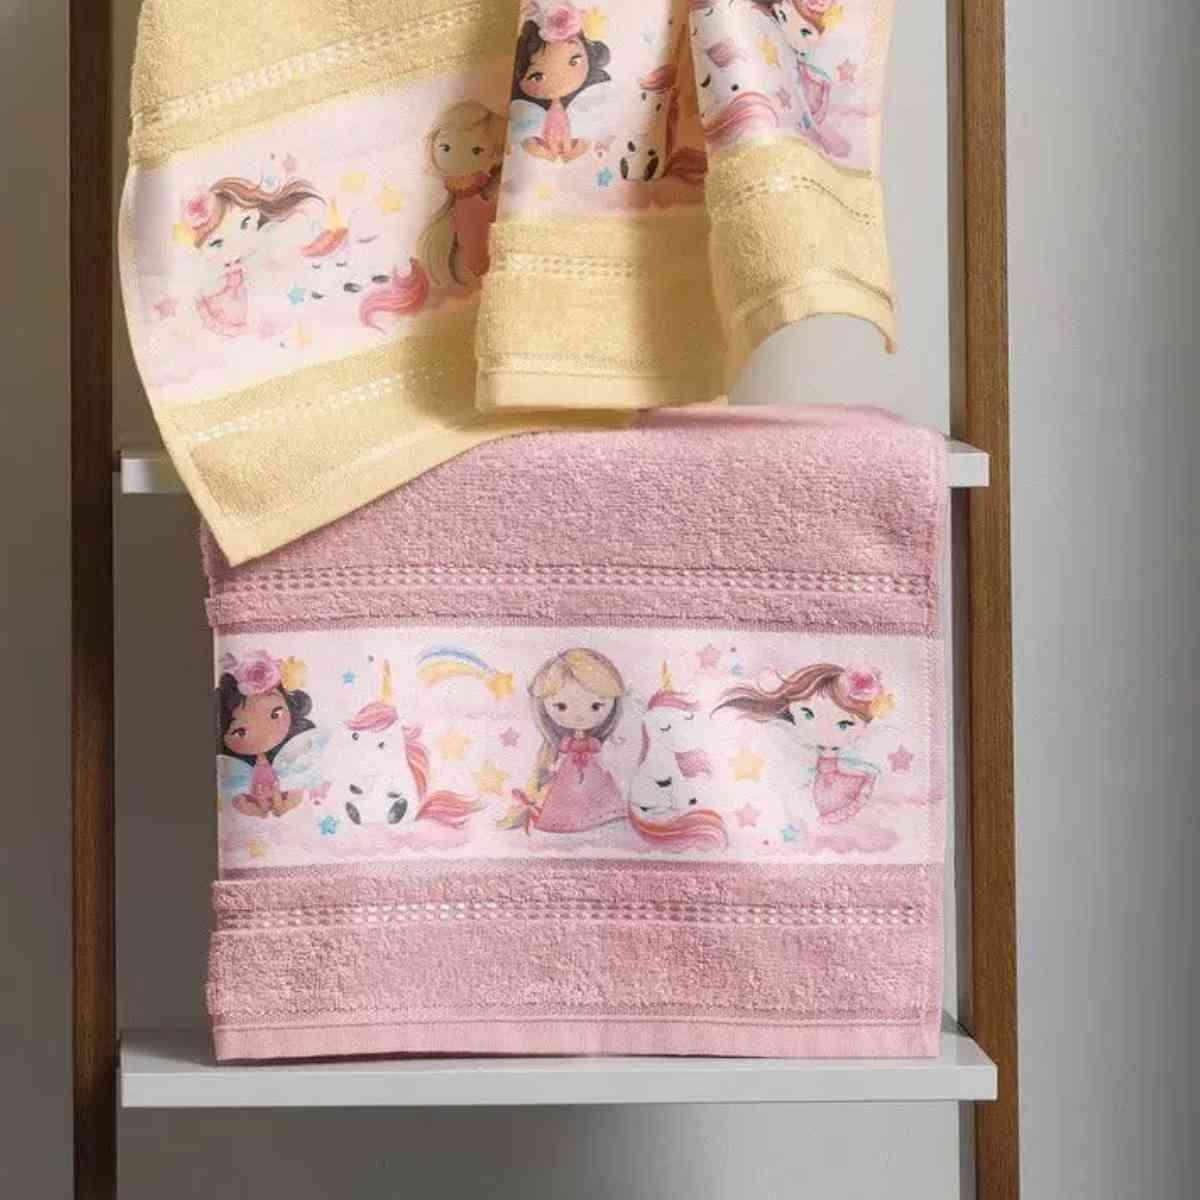 Toalha Banho Infantil Encantada Rosa Tutu